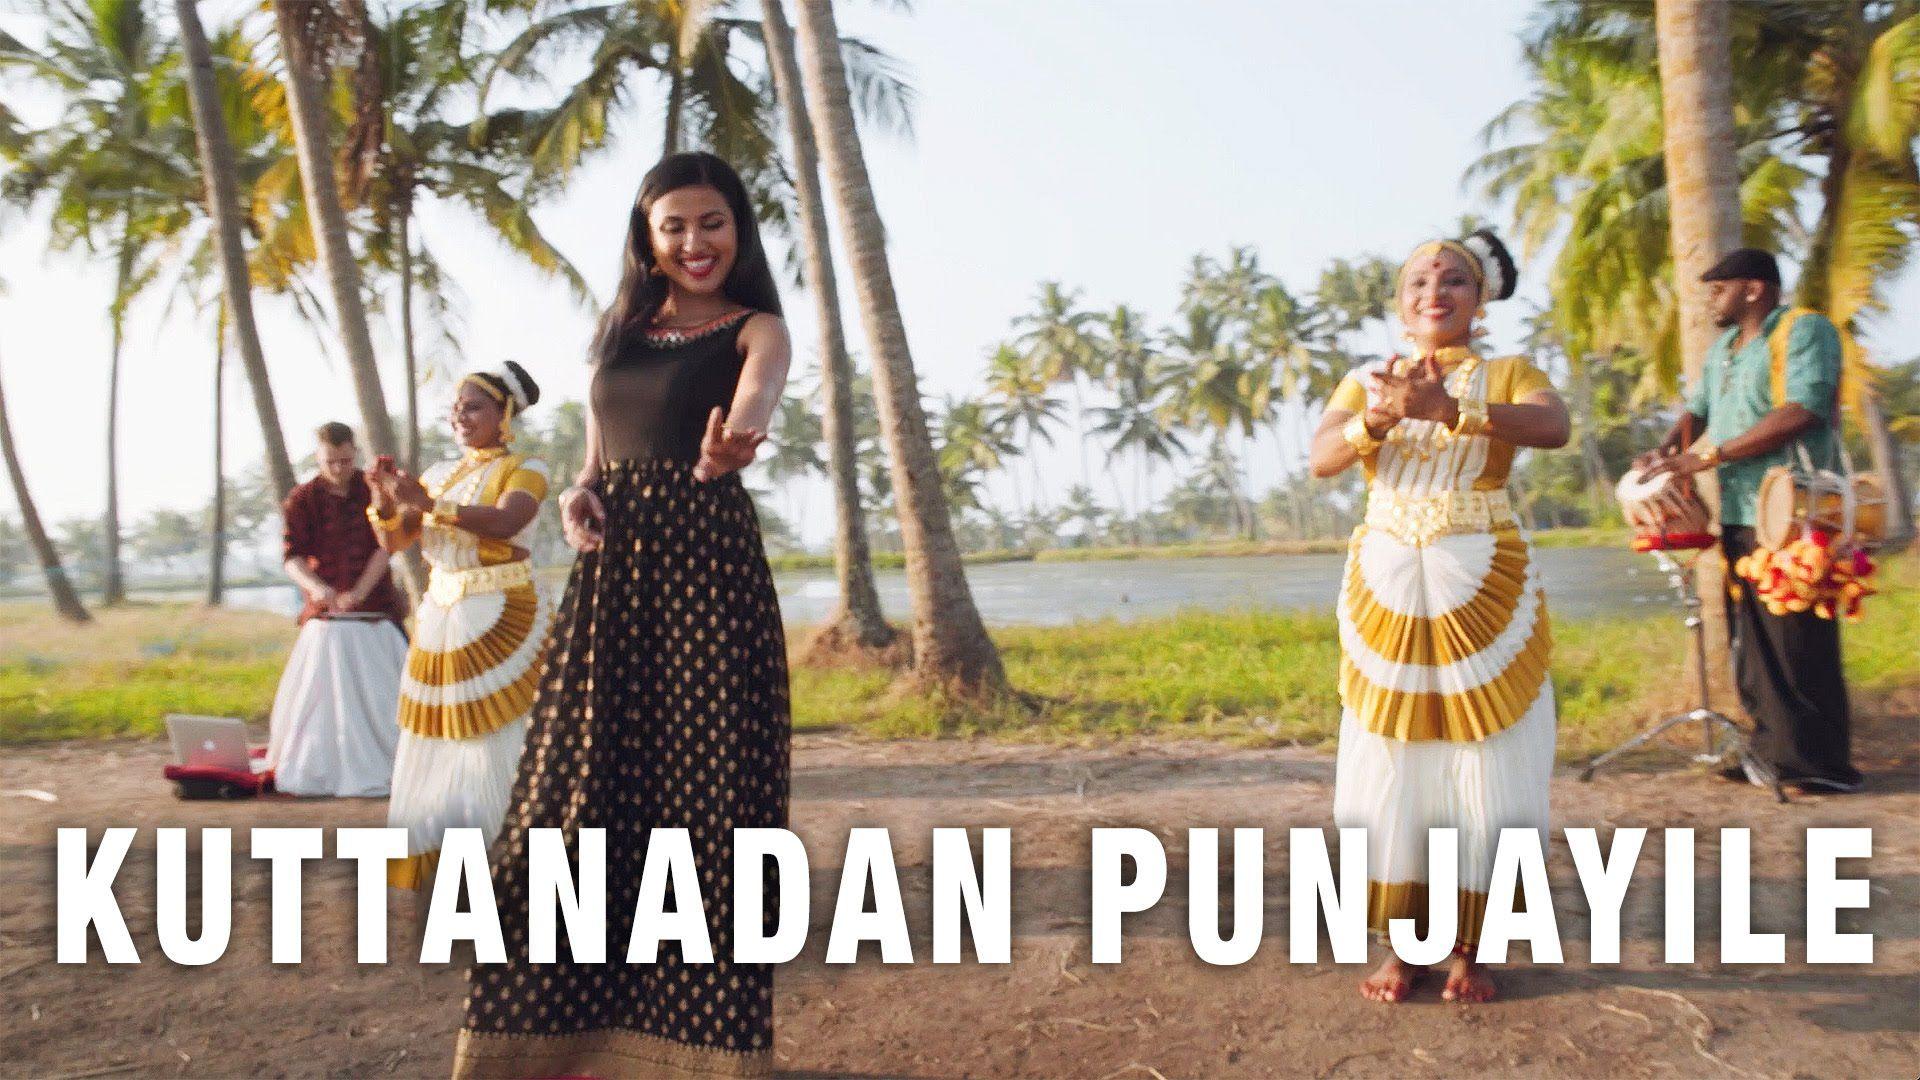 Kuttanadan Punjayile Kerala Boat Song Vidya English Remix Ft Jomy George Shankar Tucker Vidya Vox Race Songs Bollywood Music